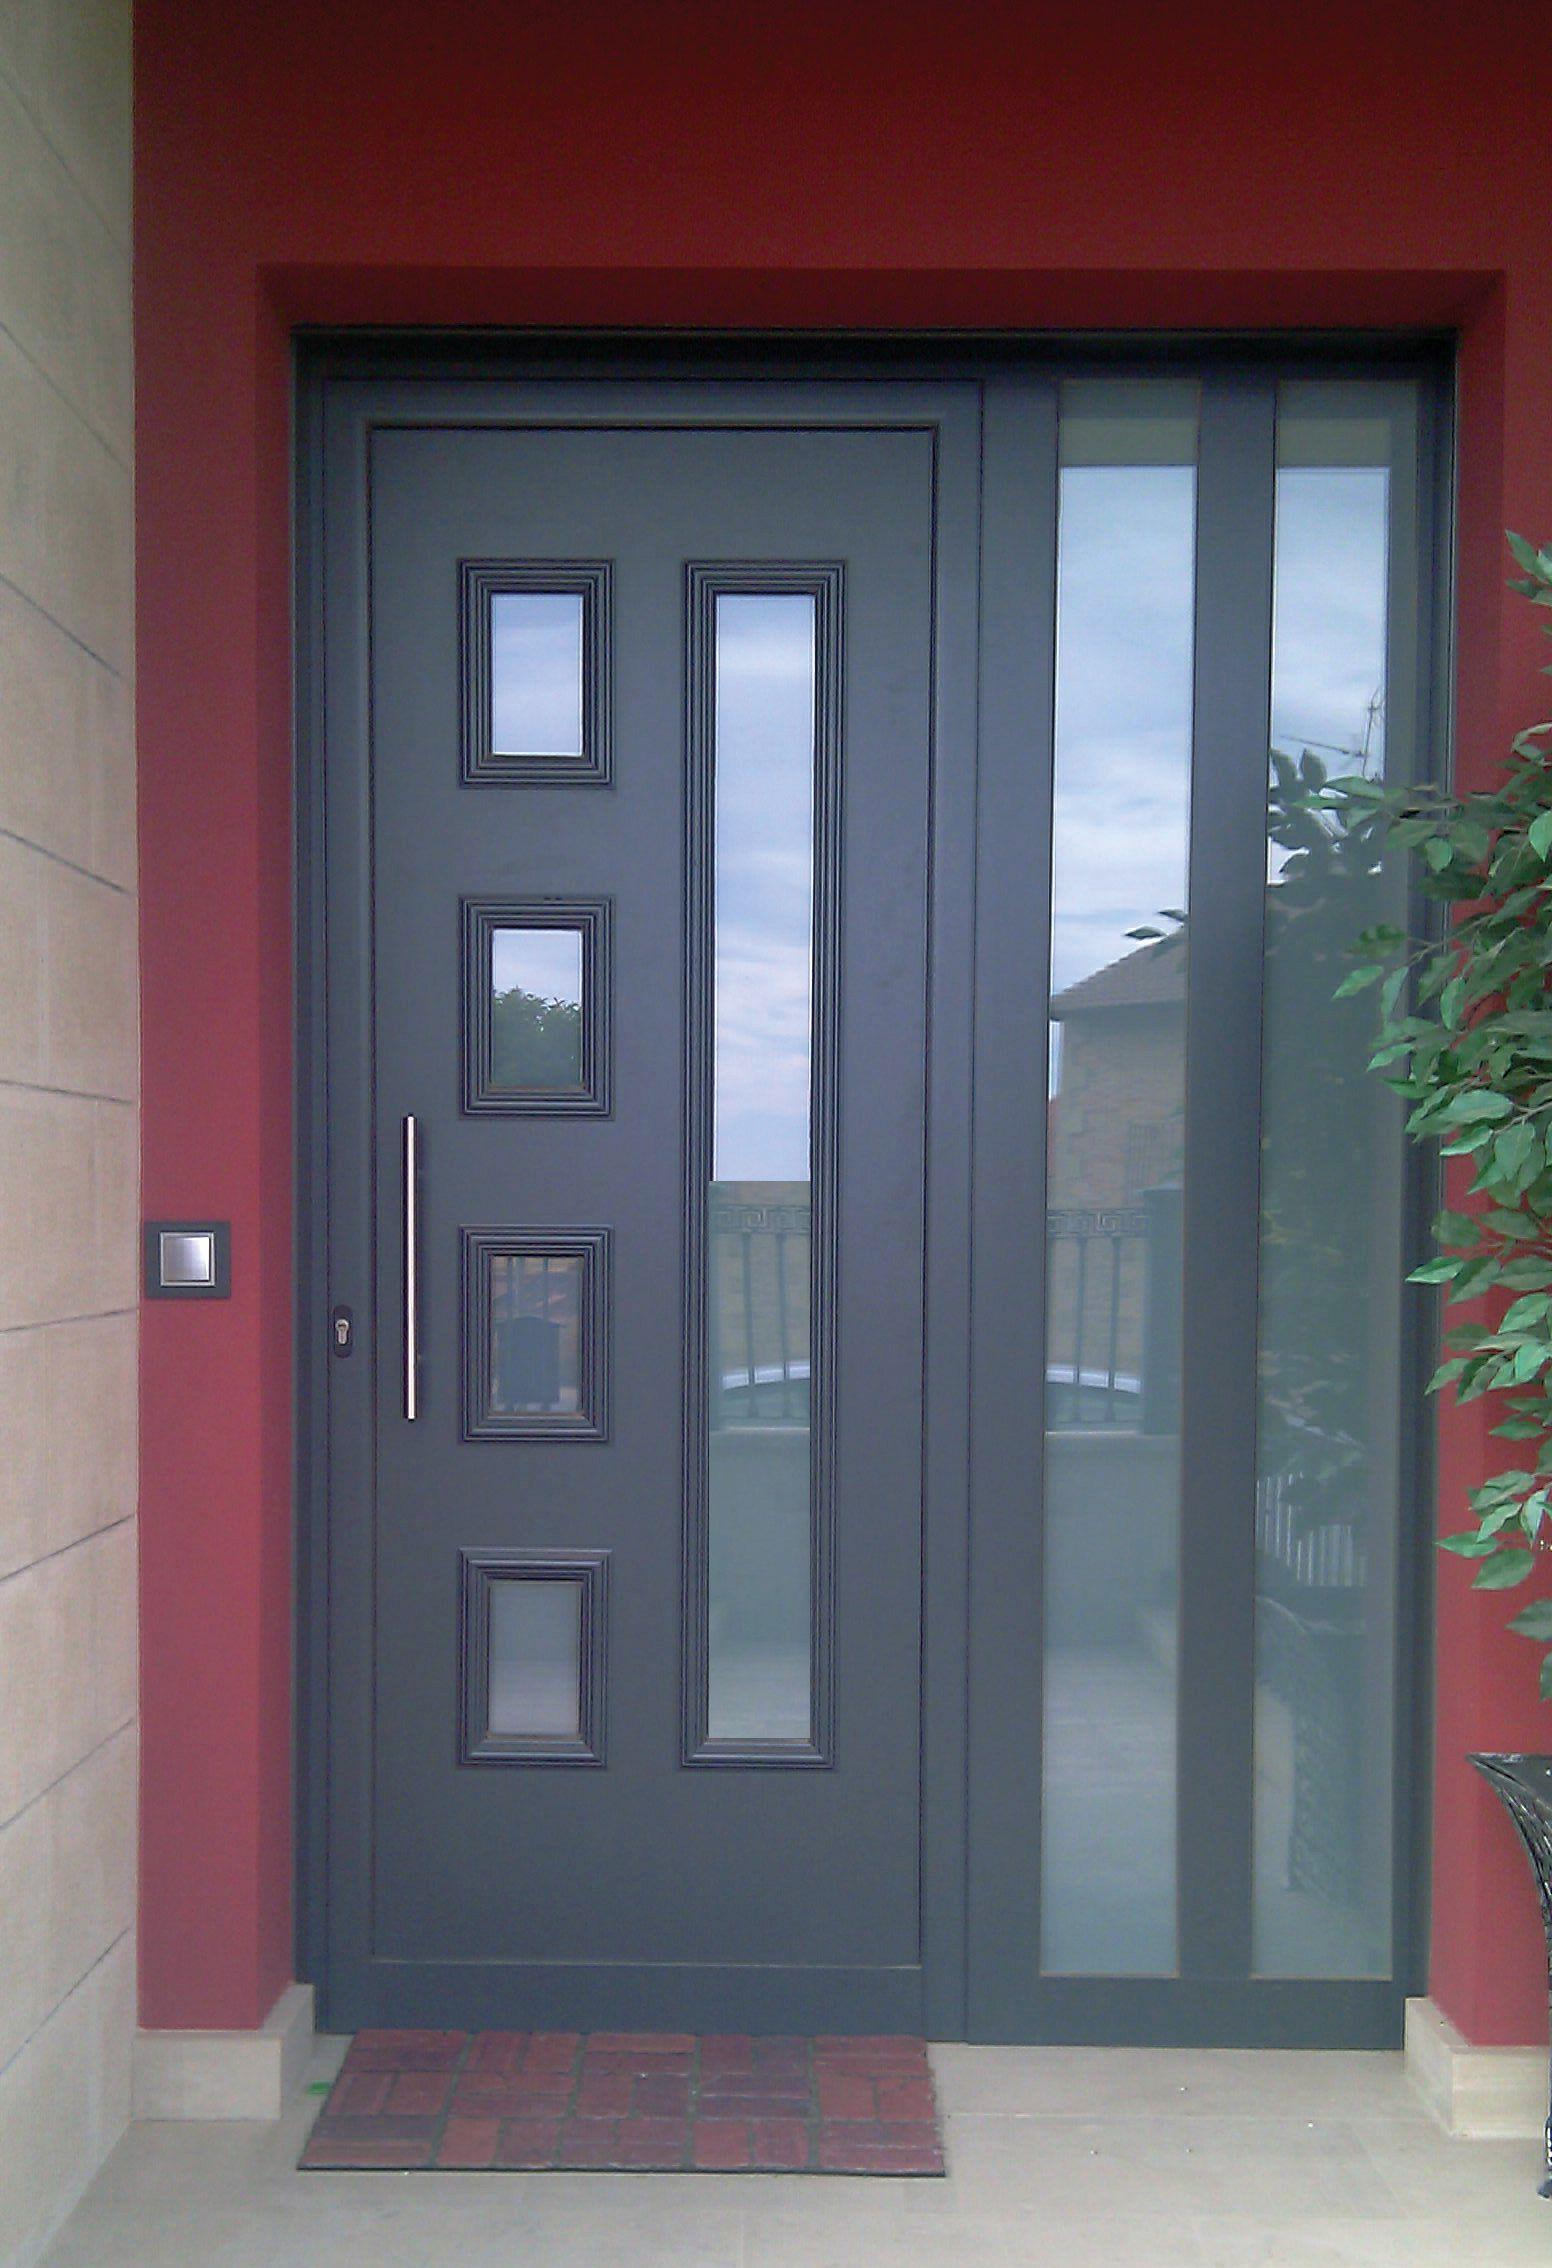 Tempo lira aluminio lacado indupanel paneles puertas for Colores ventanas aluminio lacado